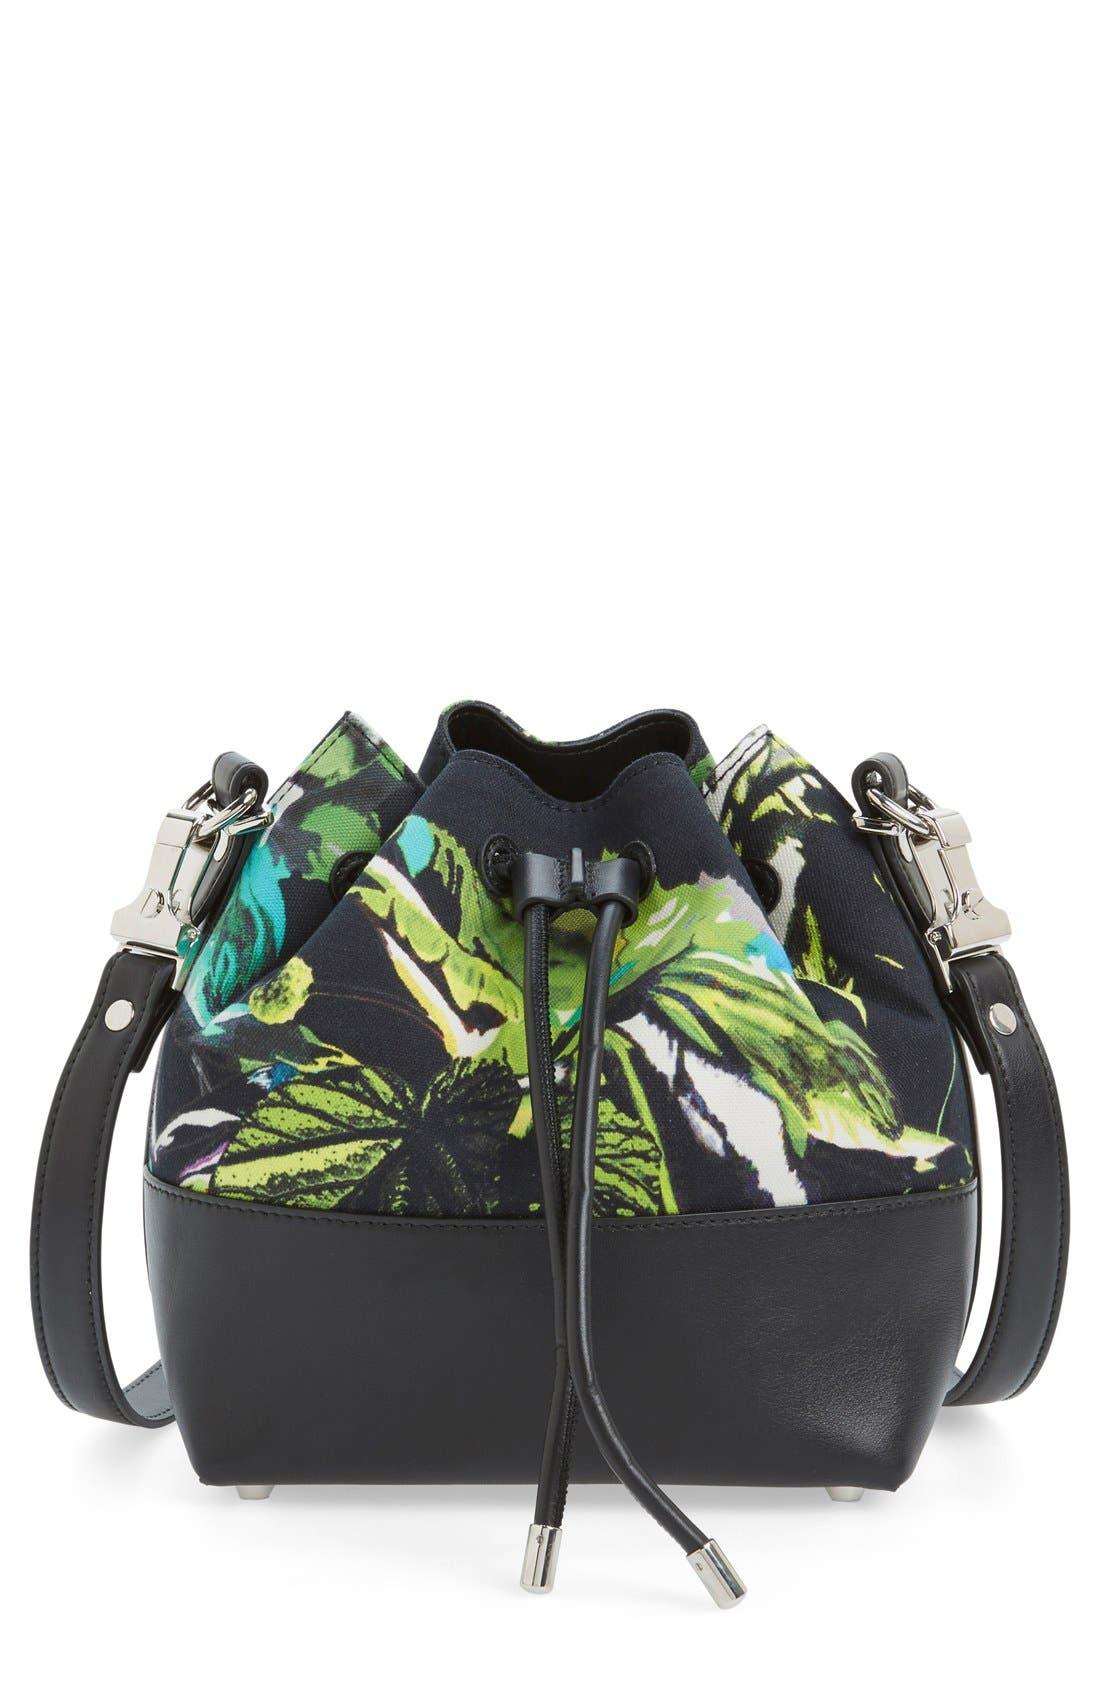 Main Image - Proenza Schouler 'Small' Bucket Bag